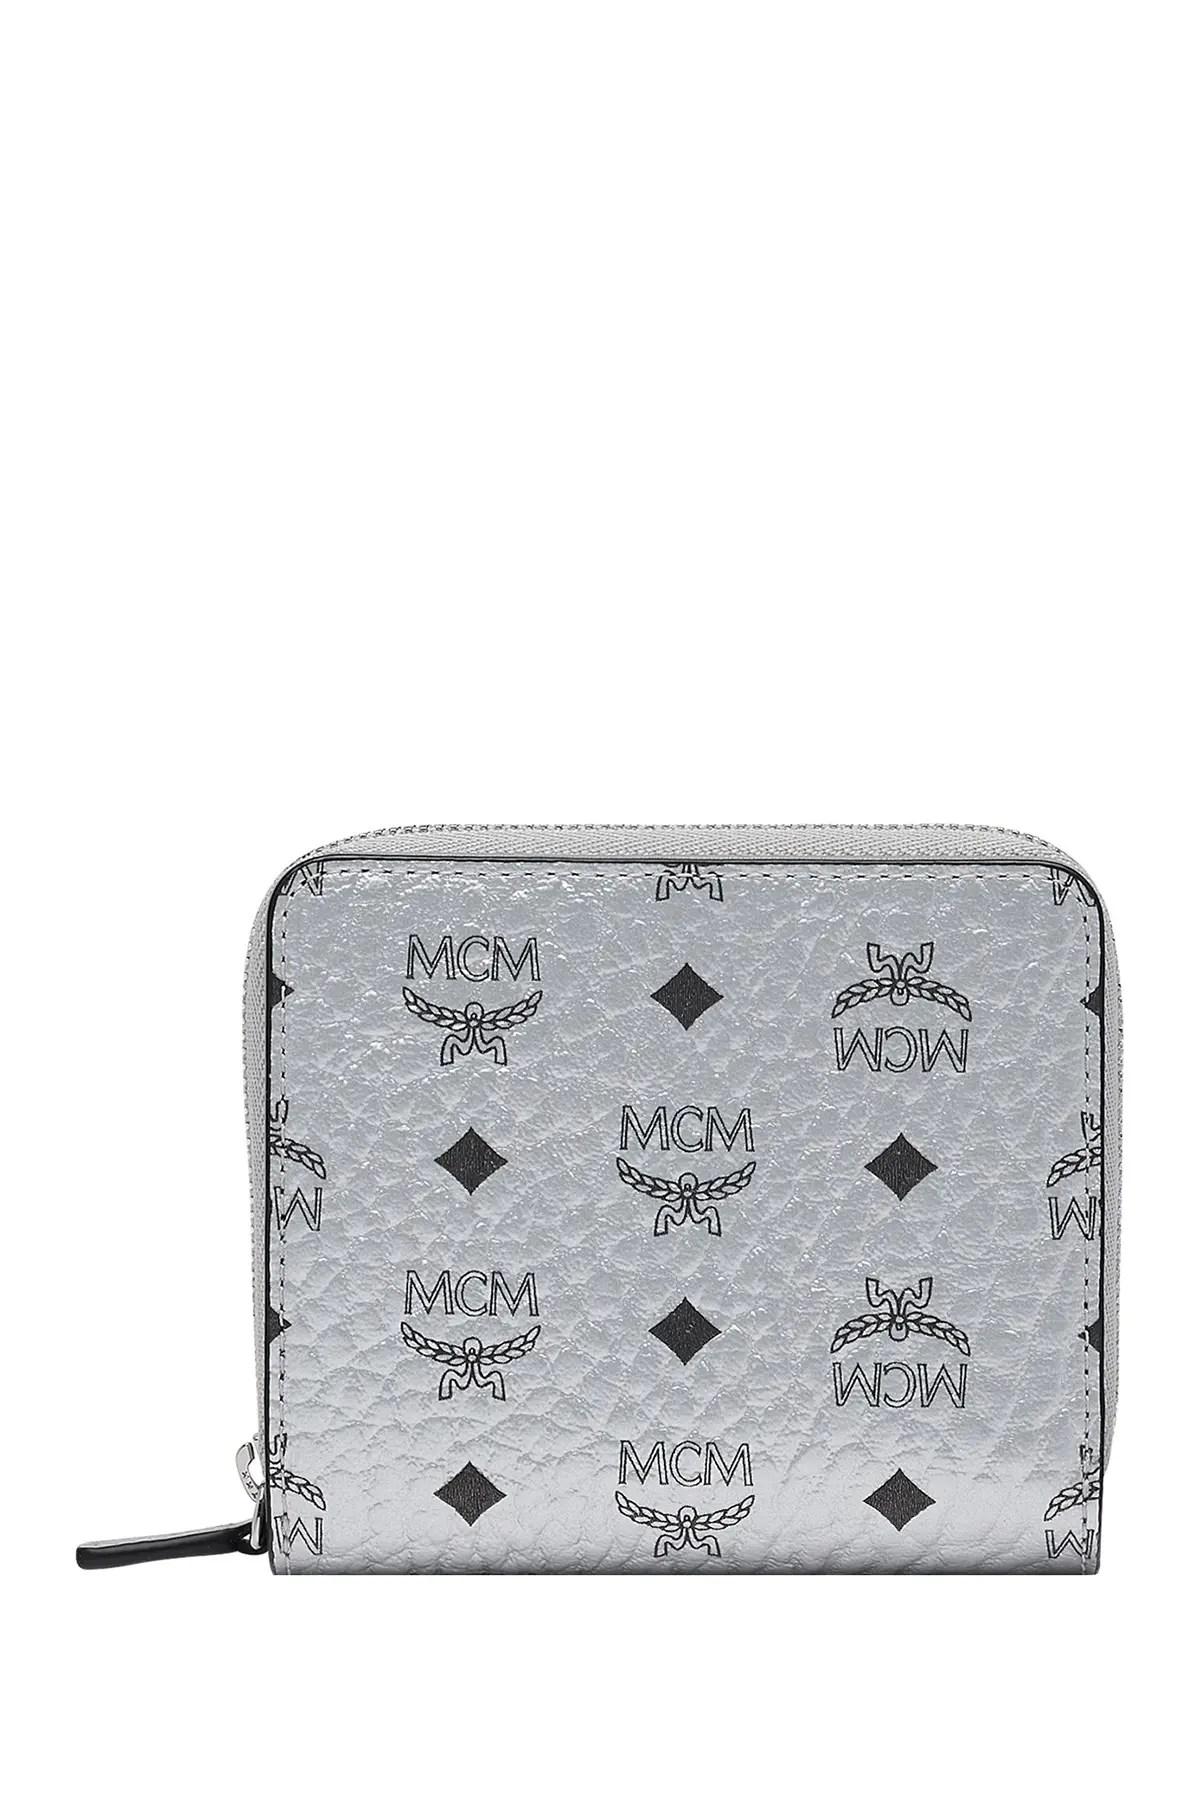 mcm visetos original zip wallet